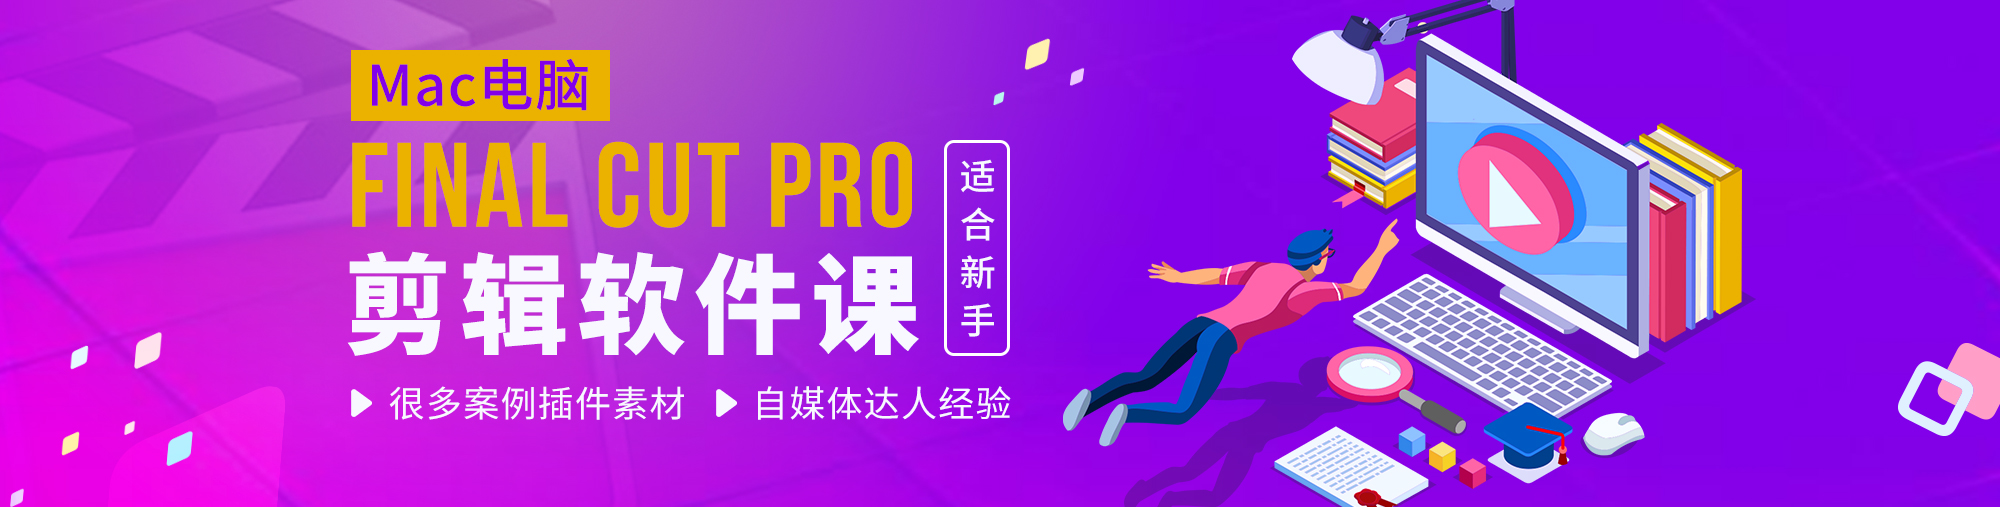 Final Cut Pro X 软件课